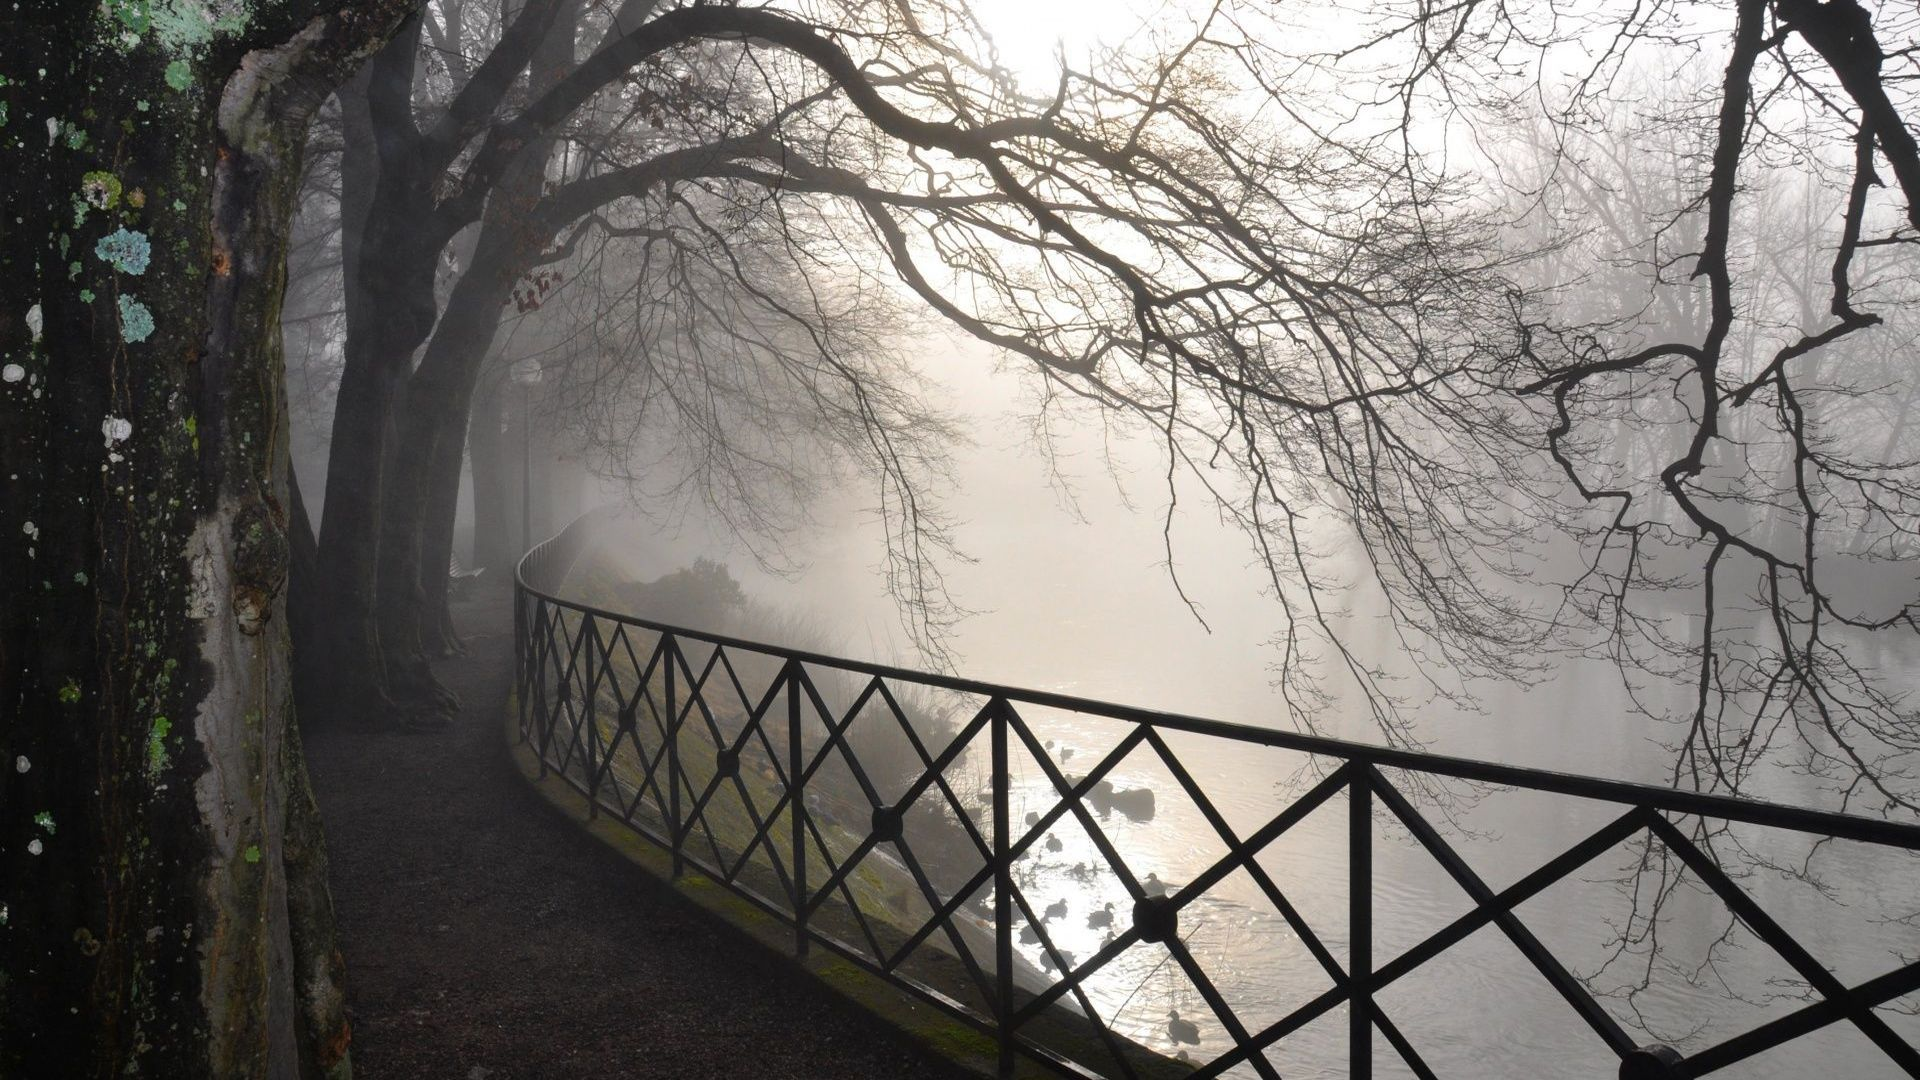 Wallpaper Trees In The Fog